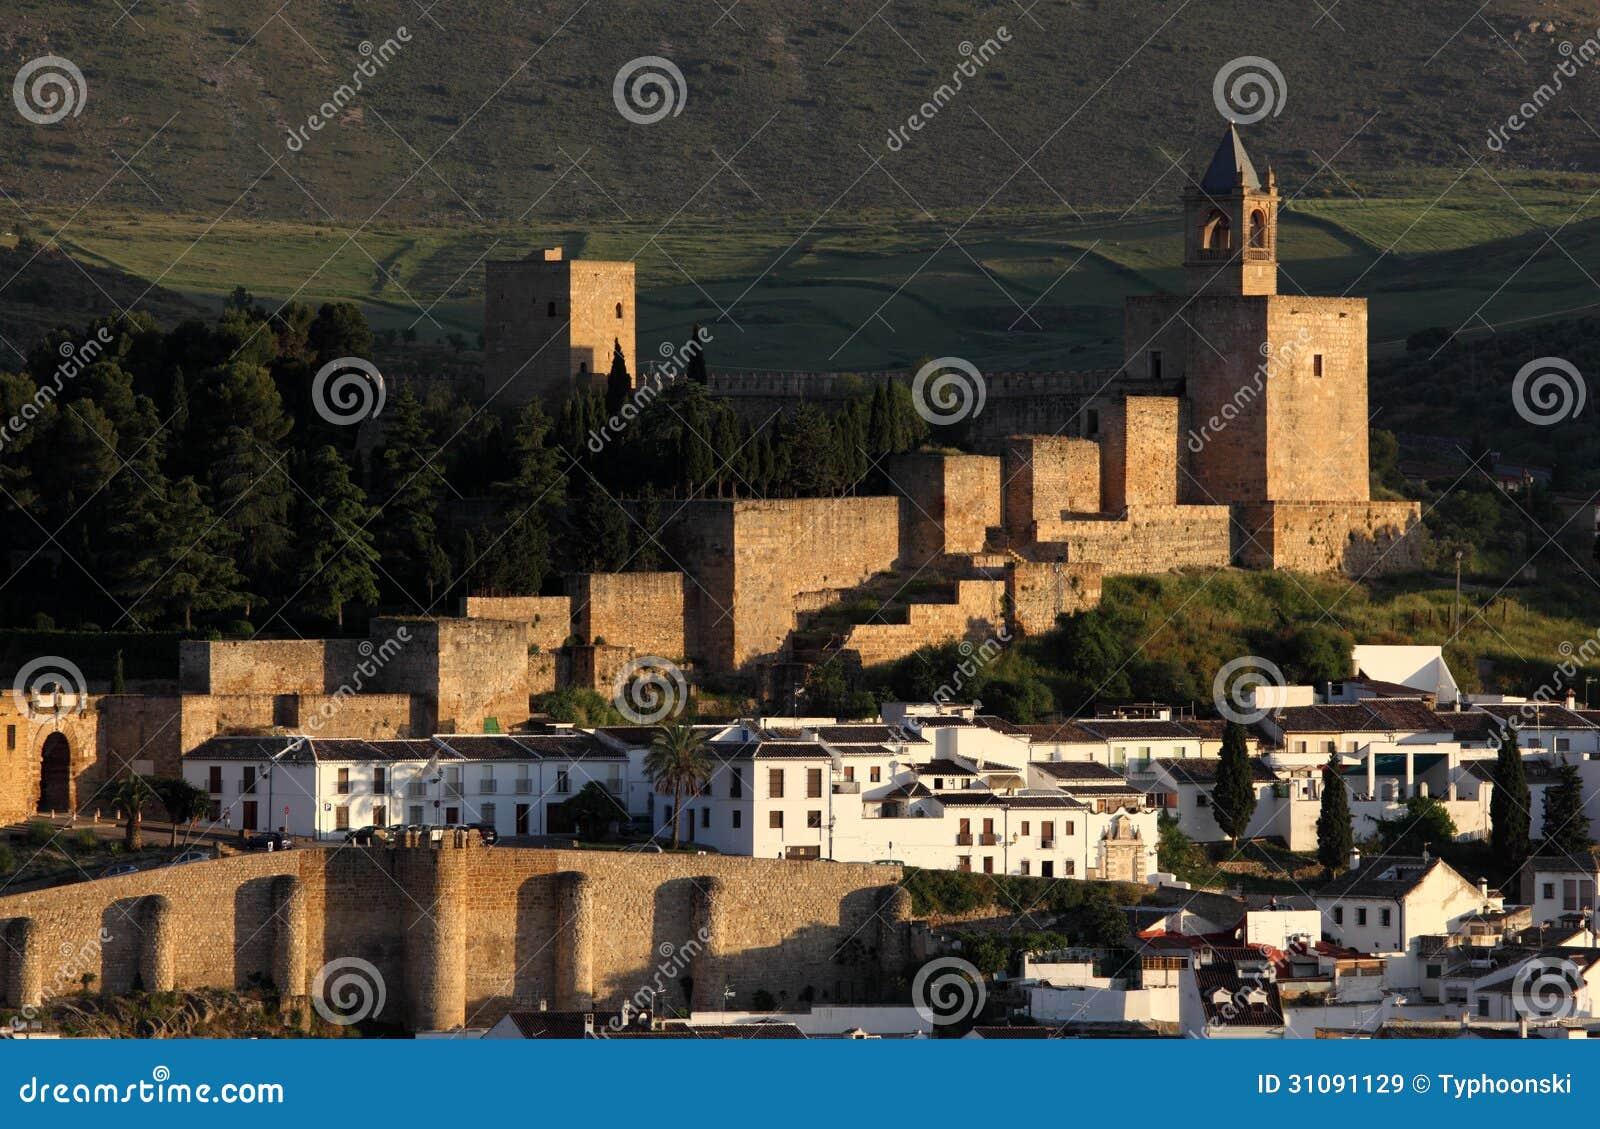 moorish castle stock photos - photo #32